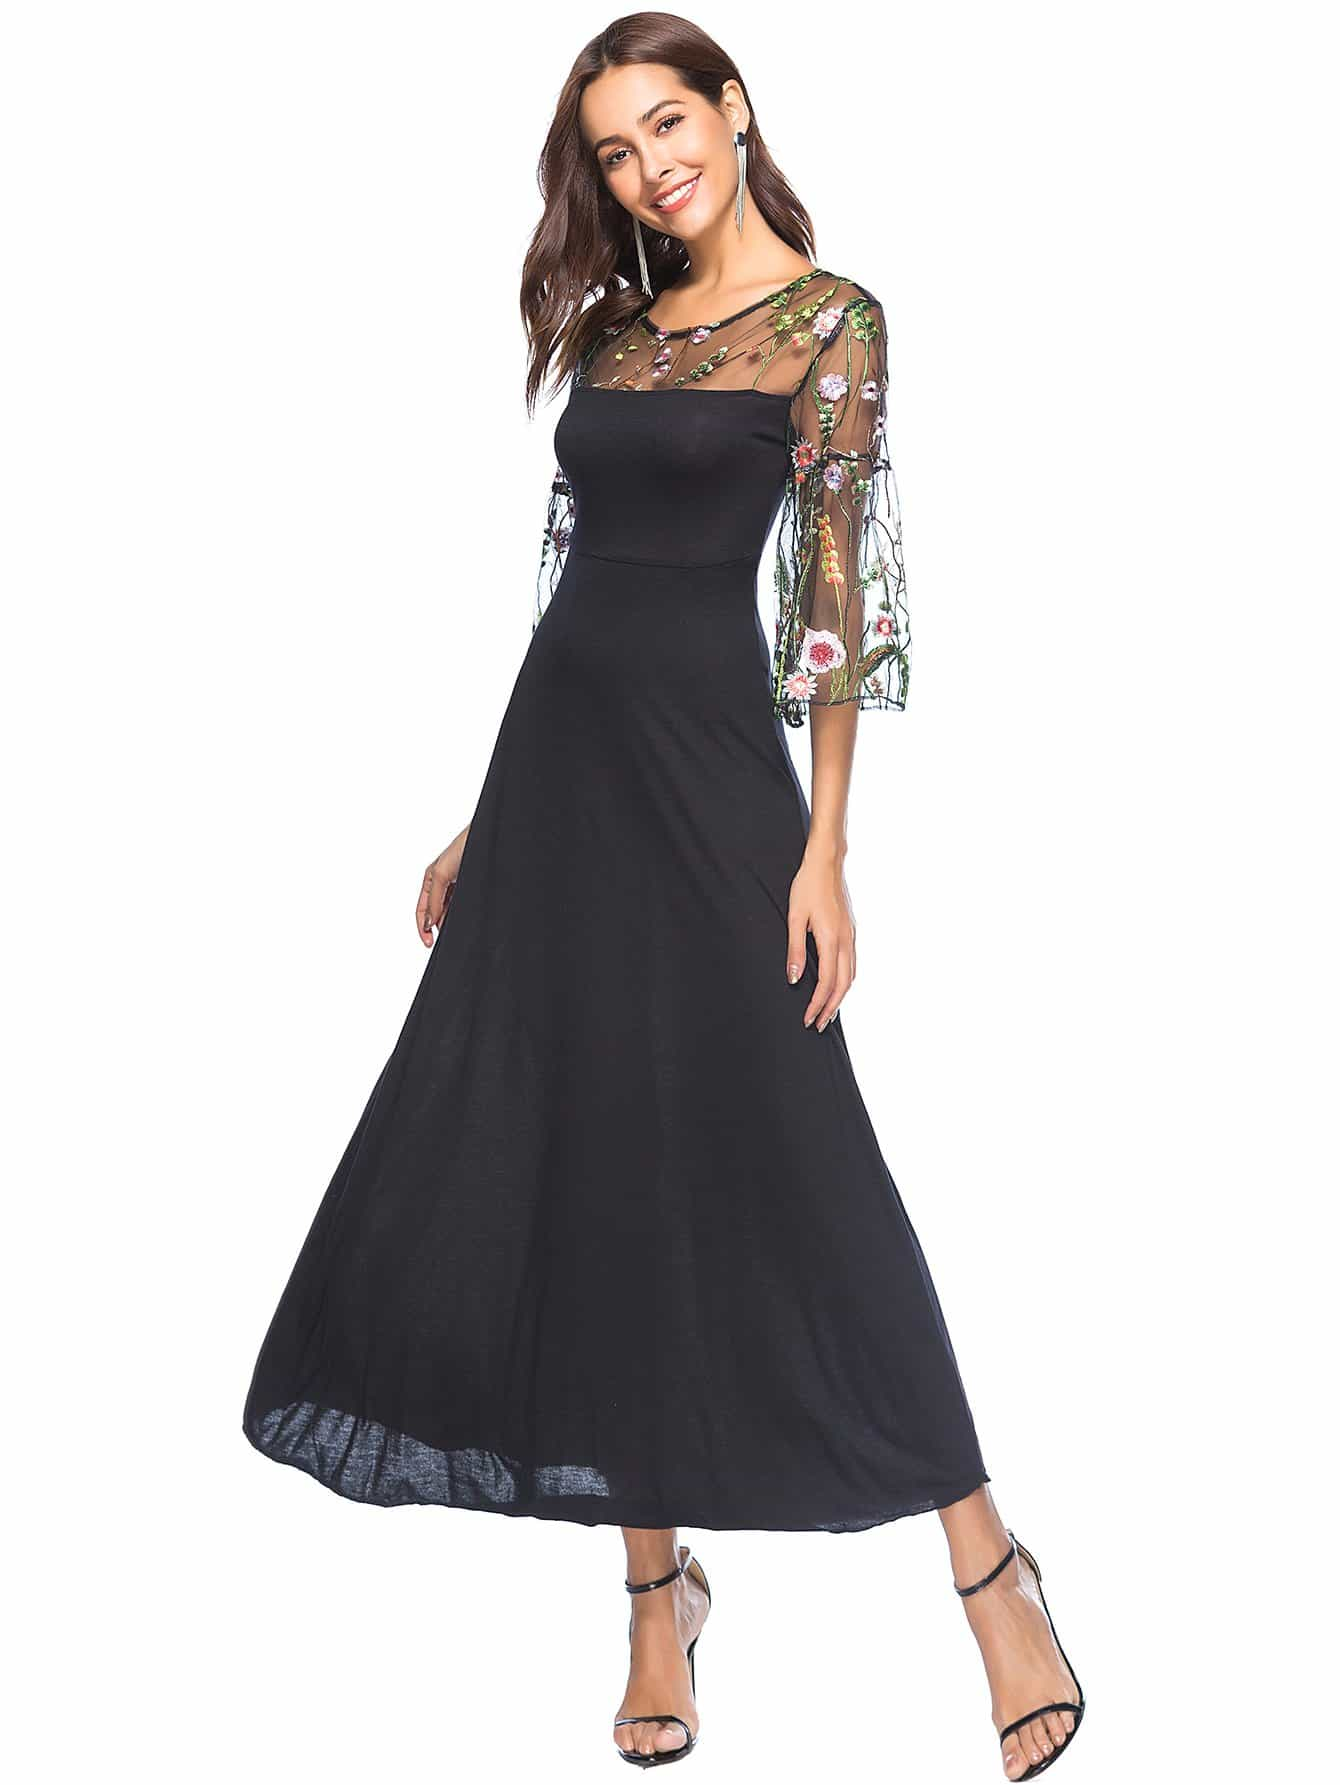 Sheer Mesh Panel Embroidery Flounce Sleeve Dress mesh panel sleeve dress